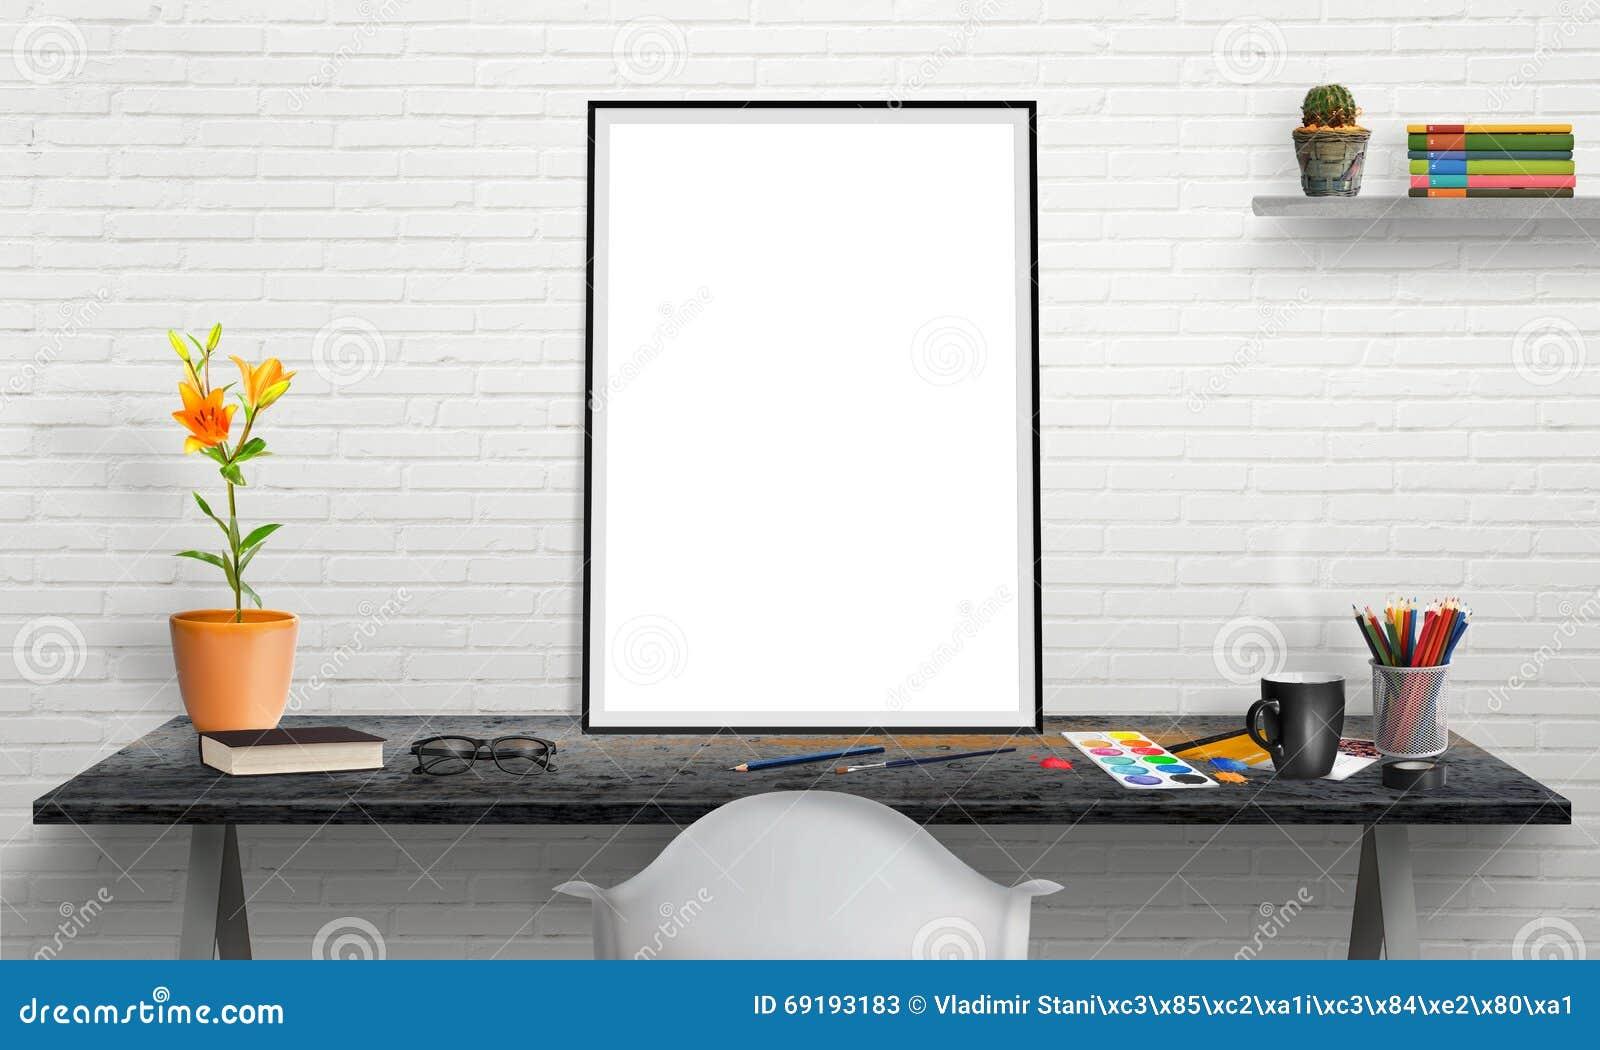 Poster Frame And Laptop On Office Desk For Mockup. Stock ...